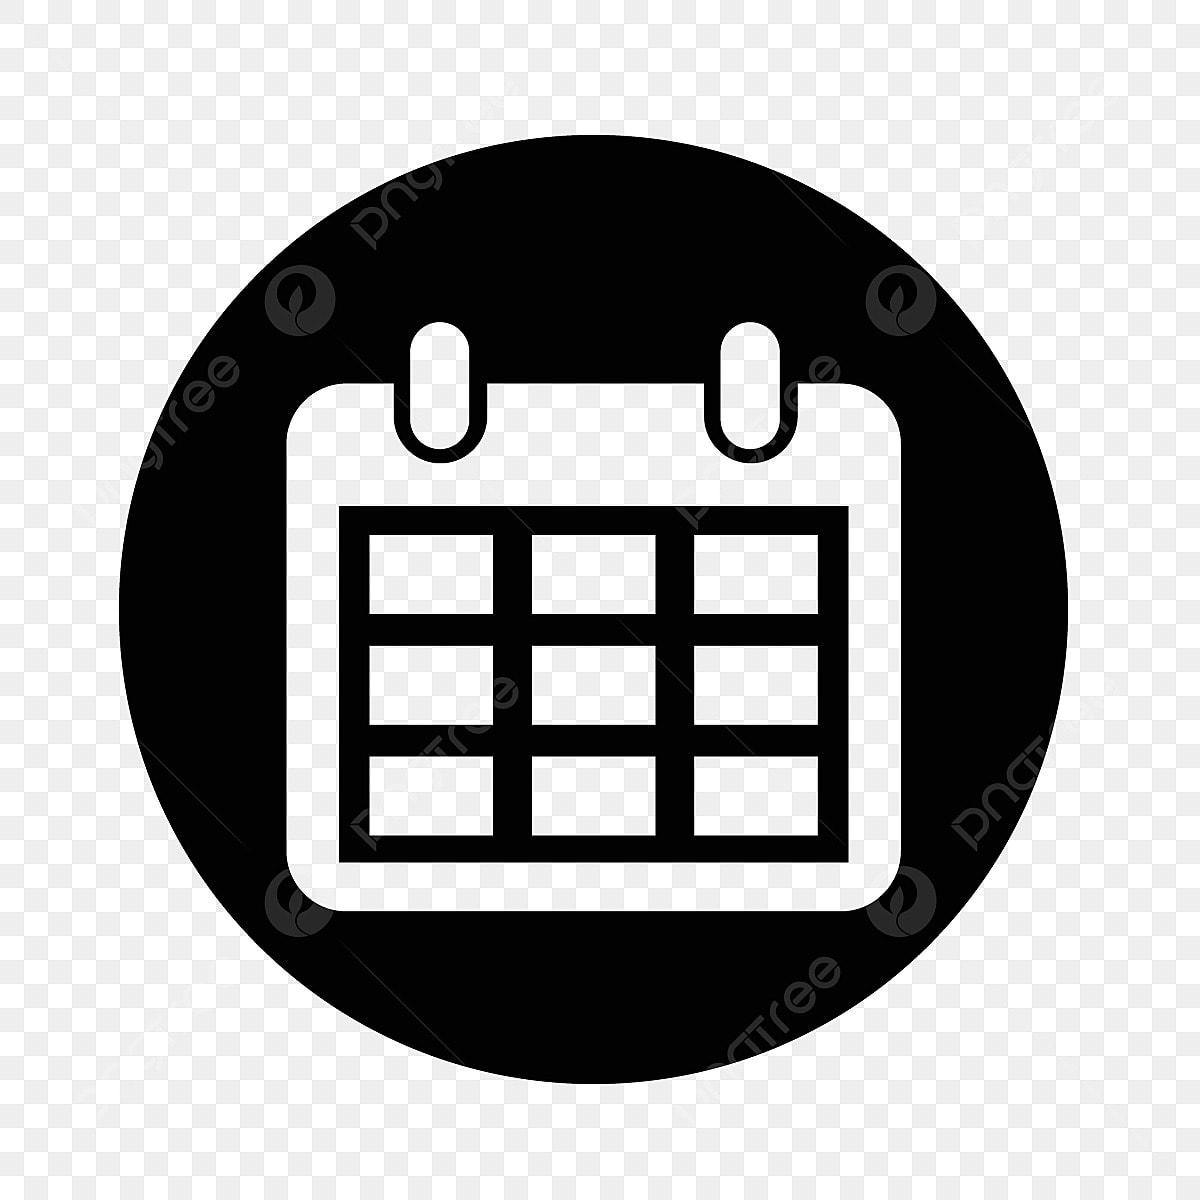 Calendario Vector.Icono De Calendario Calendario Icono Vector Png Y Vector Para